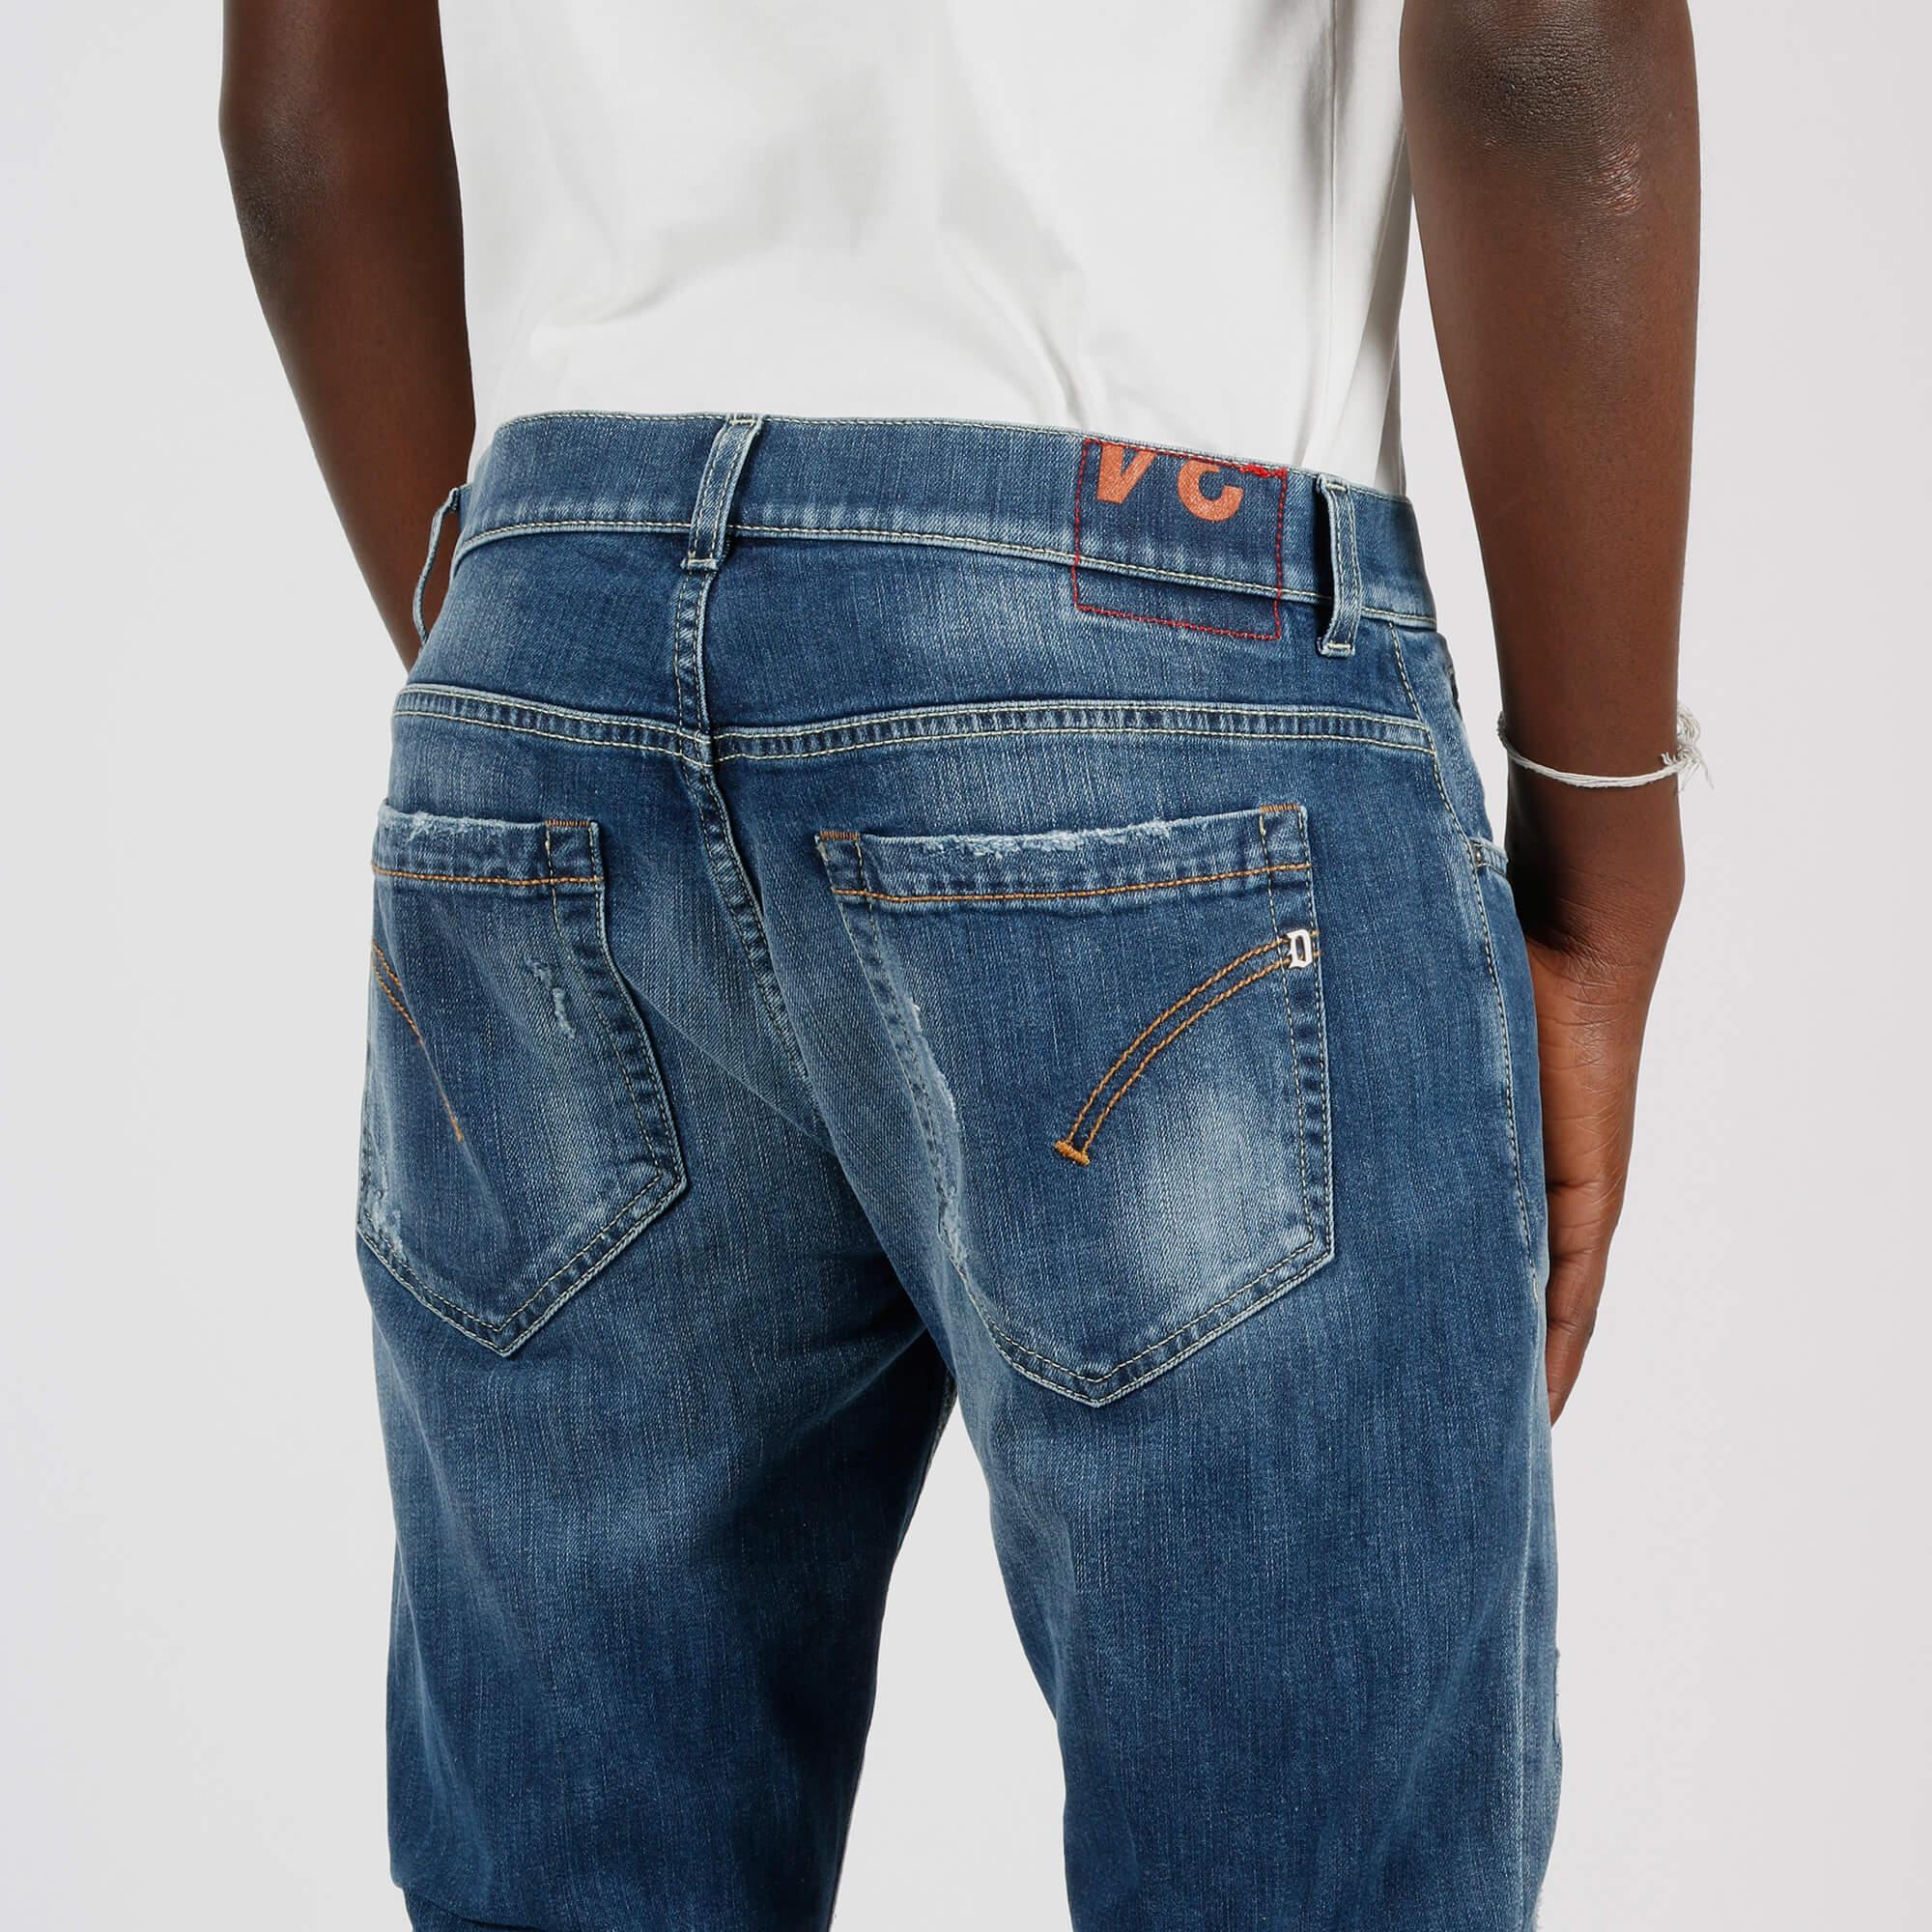 Jeans george strappi - Denim